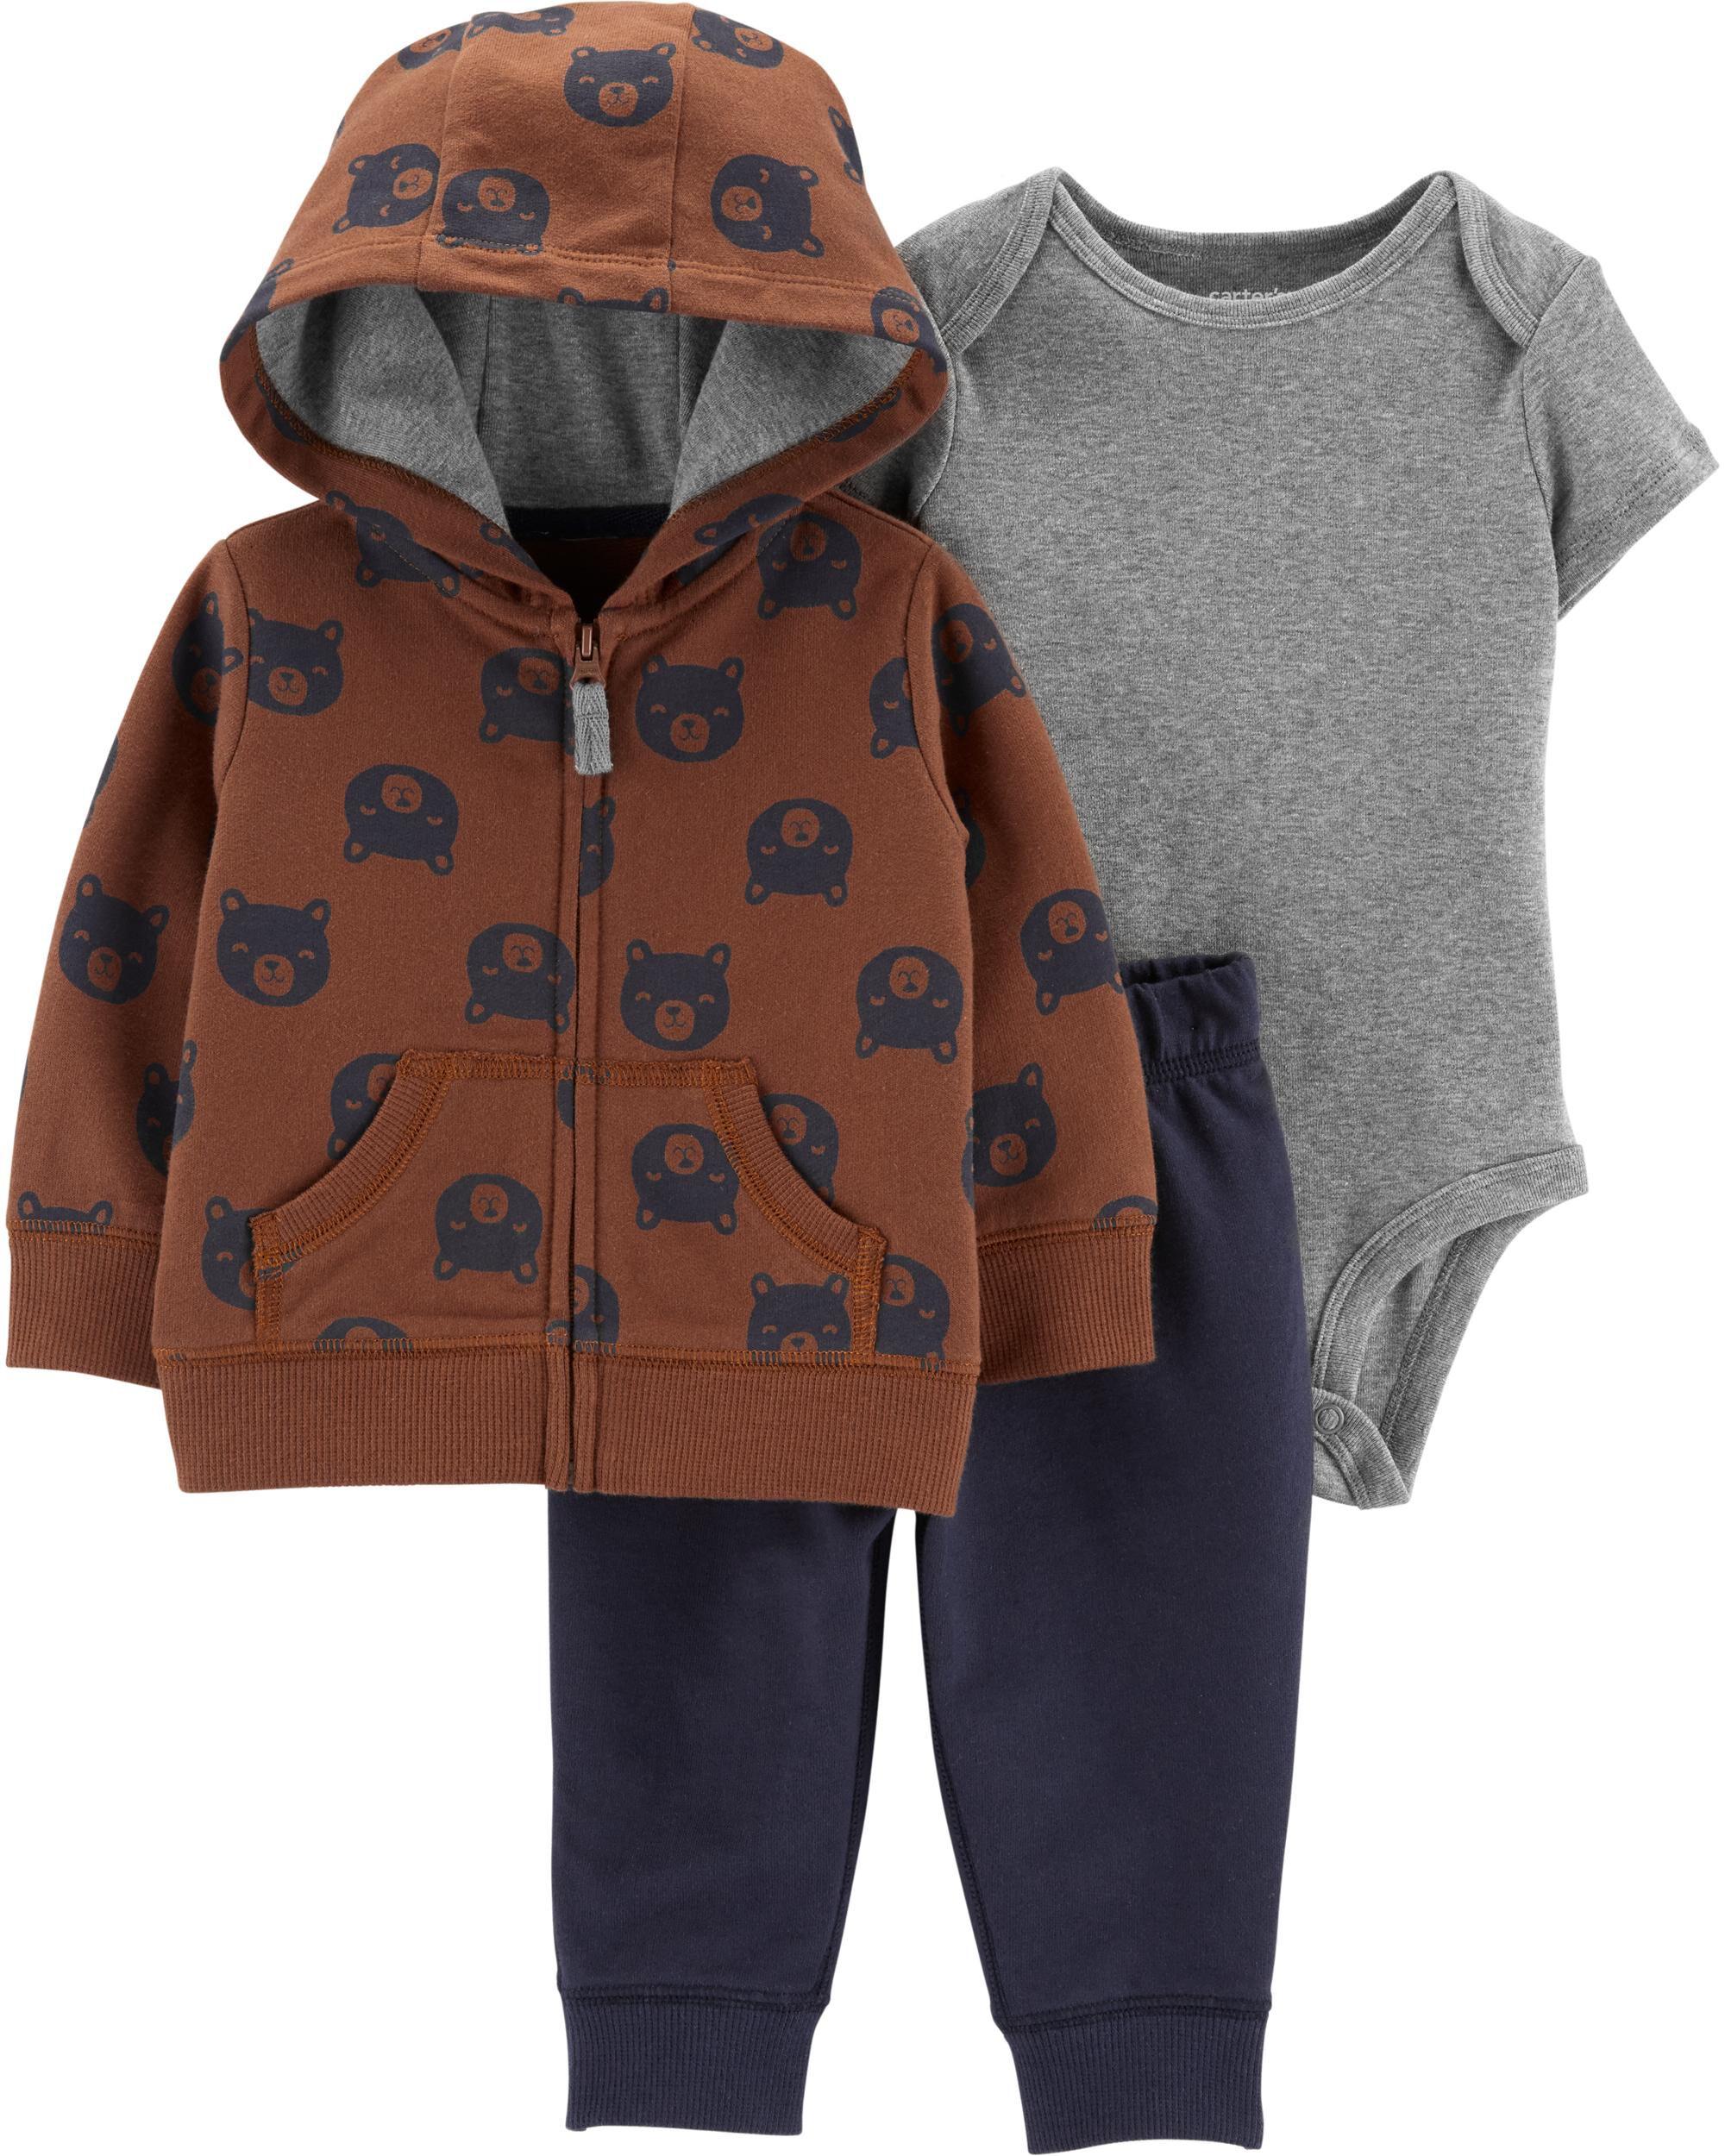 *CLEARANCE* 3-Piece Bear Little Jacket Set